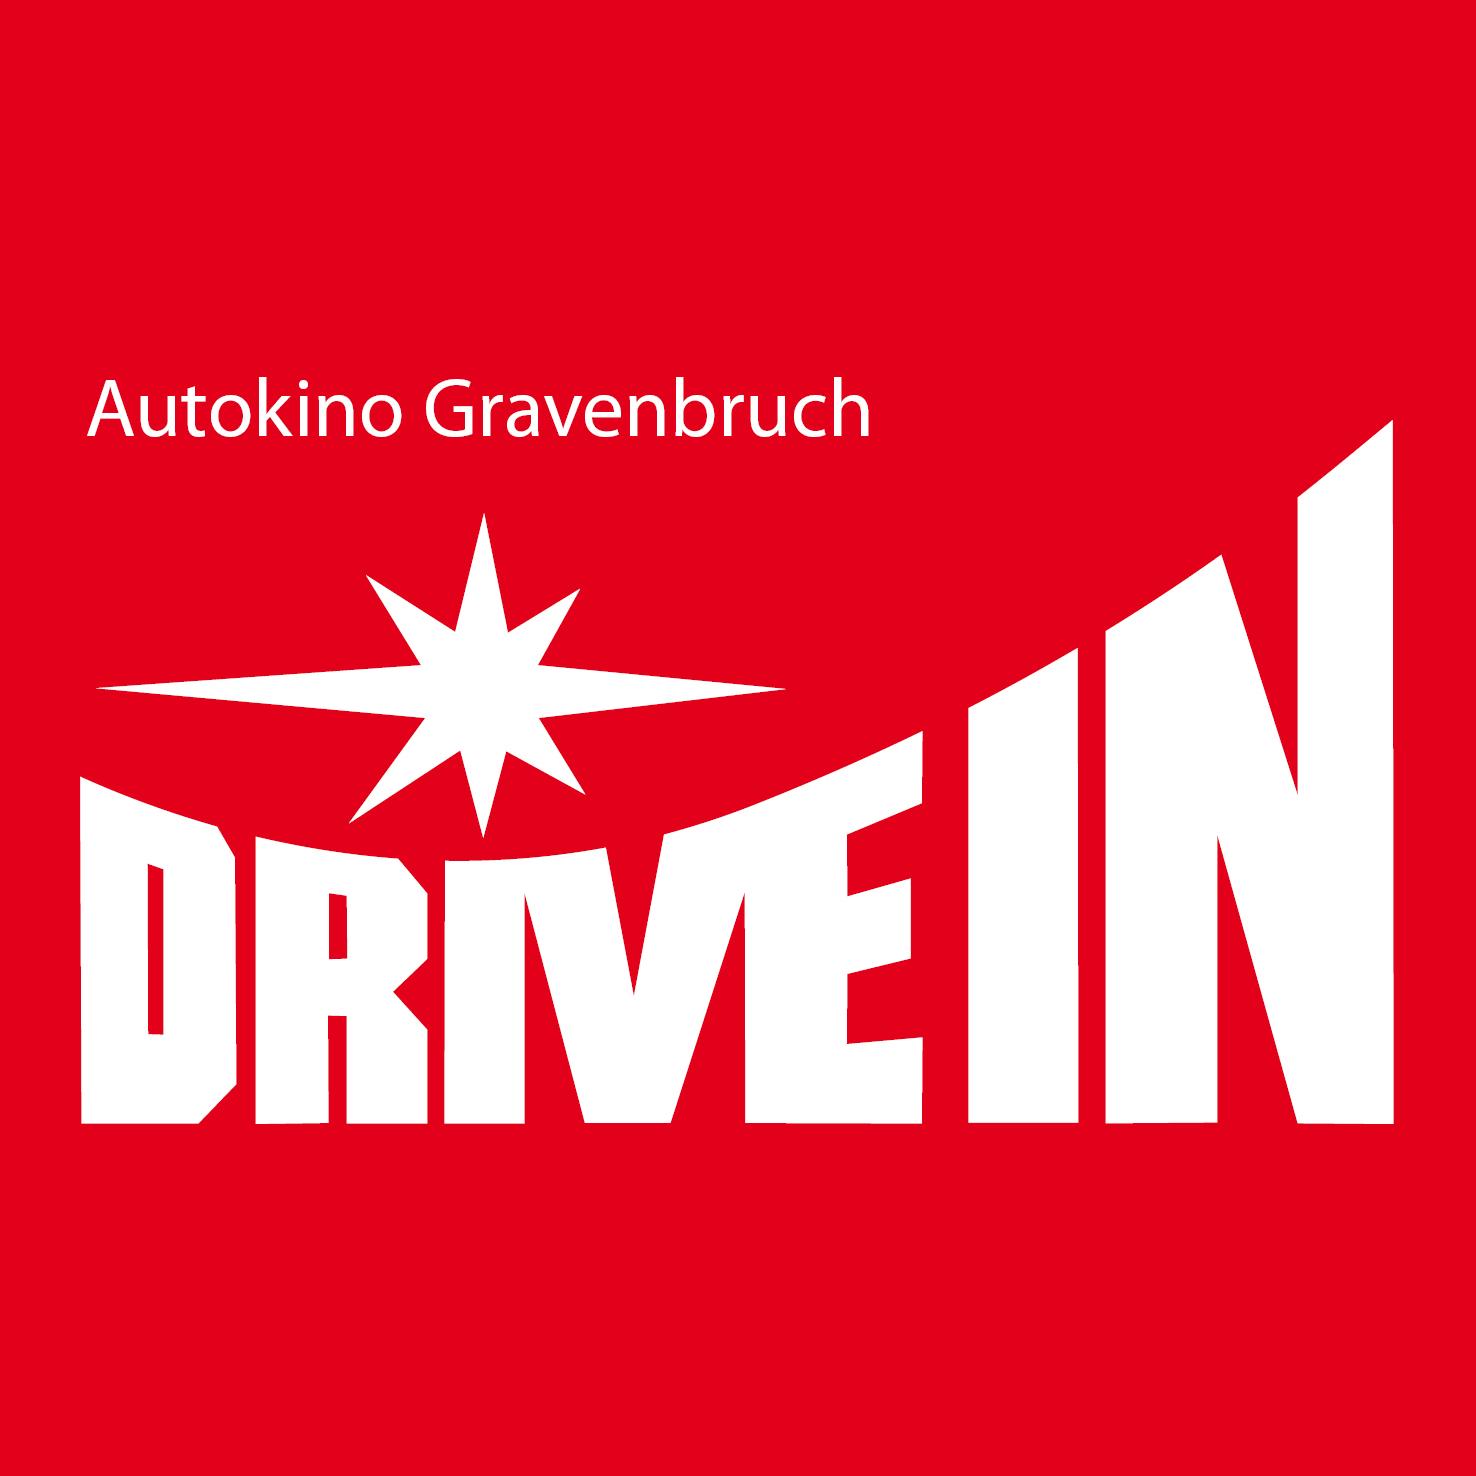 Autokino Gravenbruch